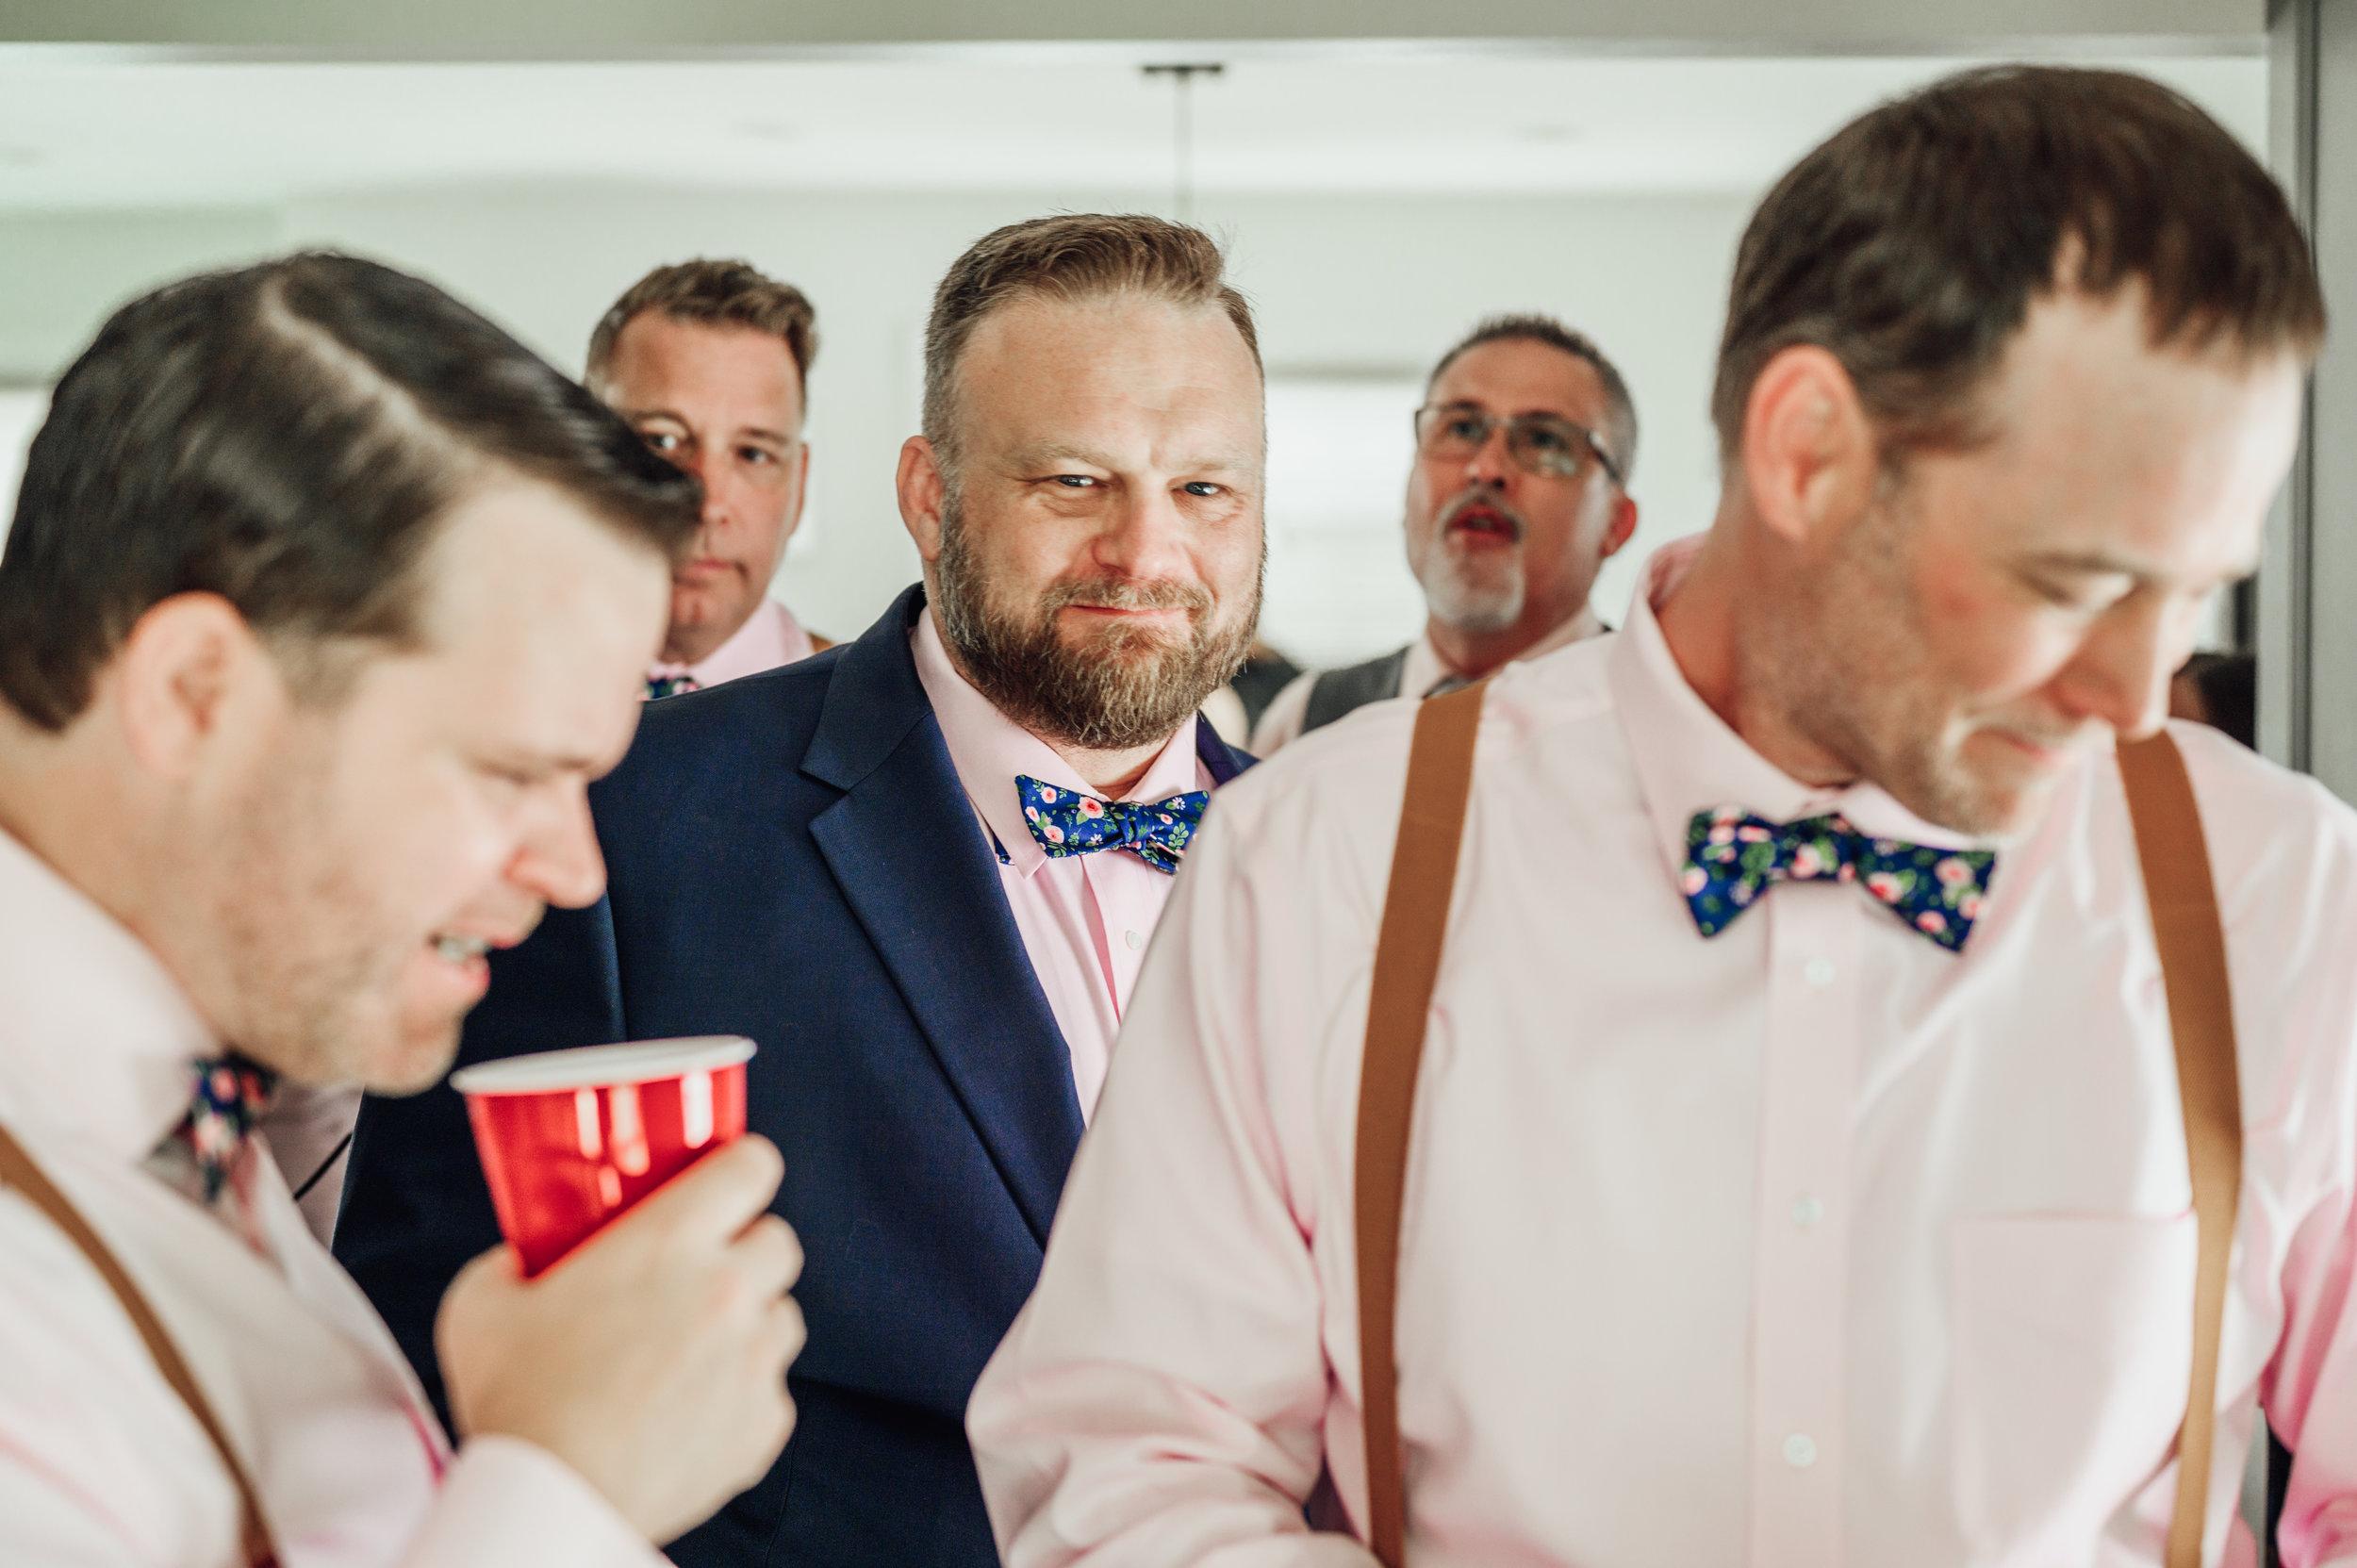 New Jersey Wedding Photographer, Felsberg Photography LBI wedding photography 49.jpg